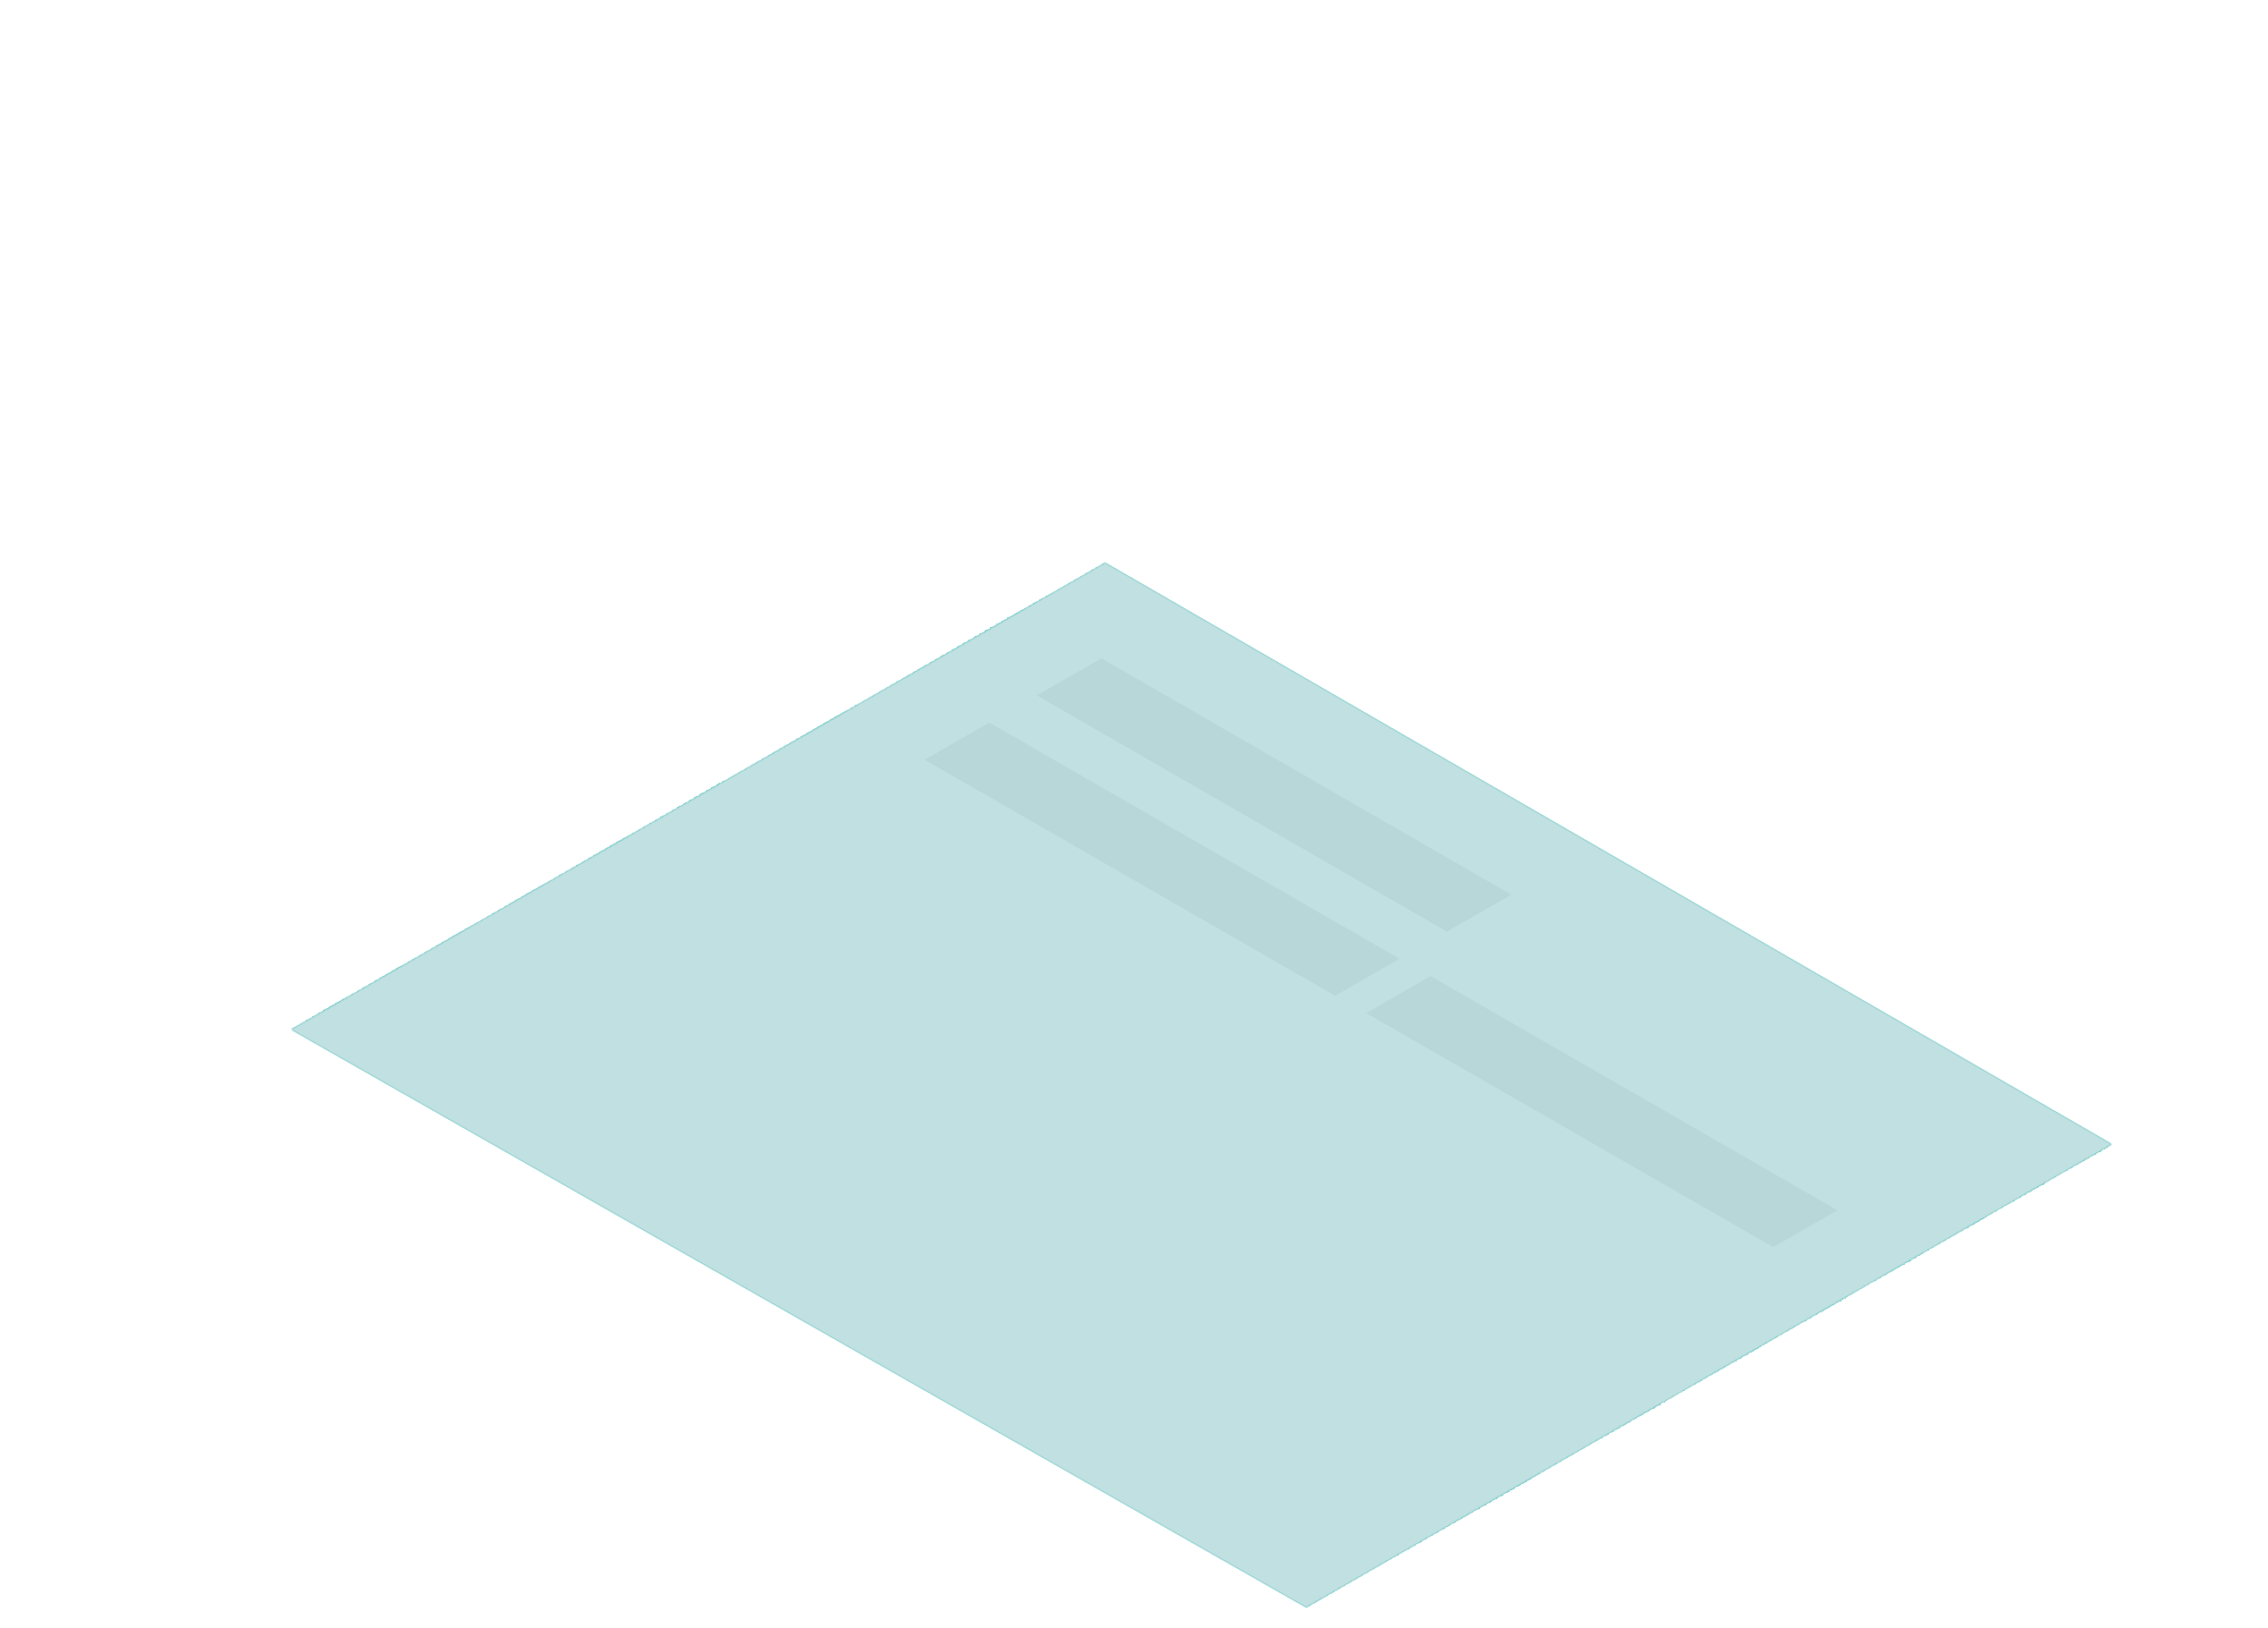 Teal screen